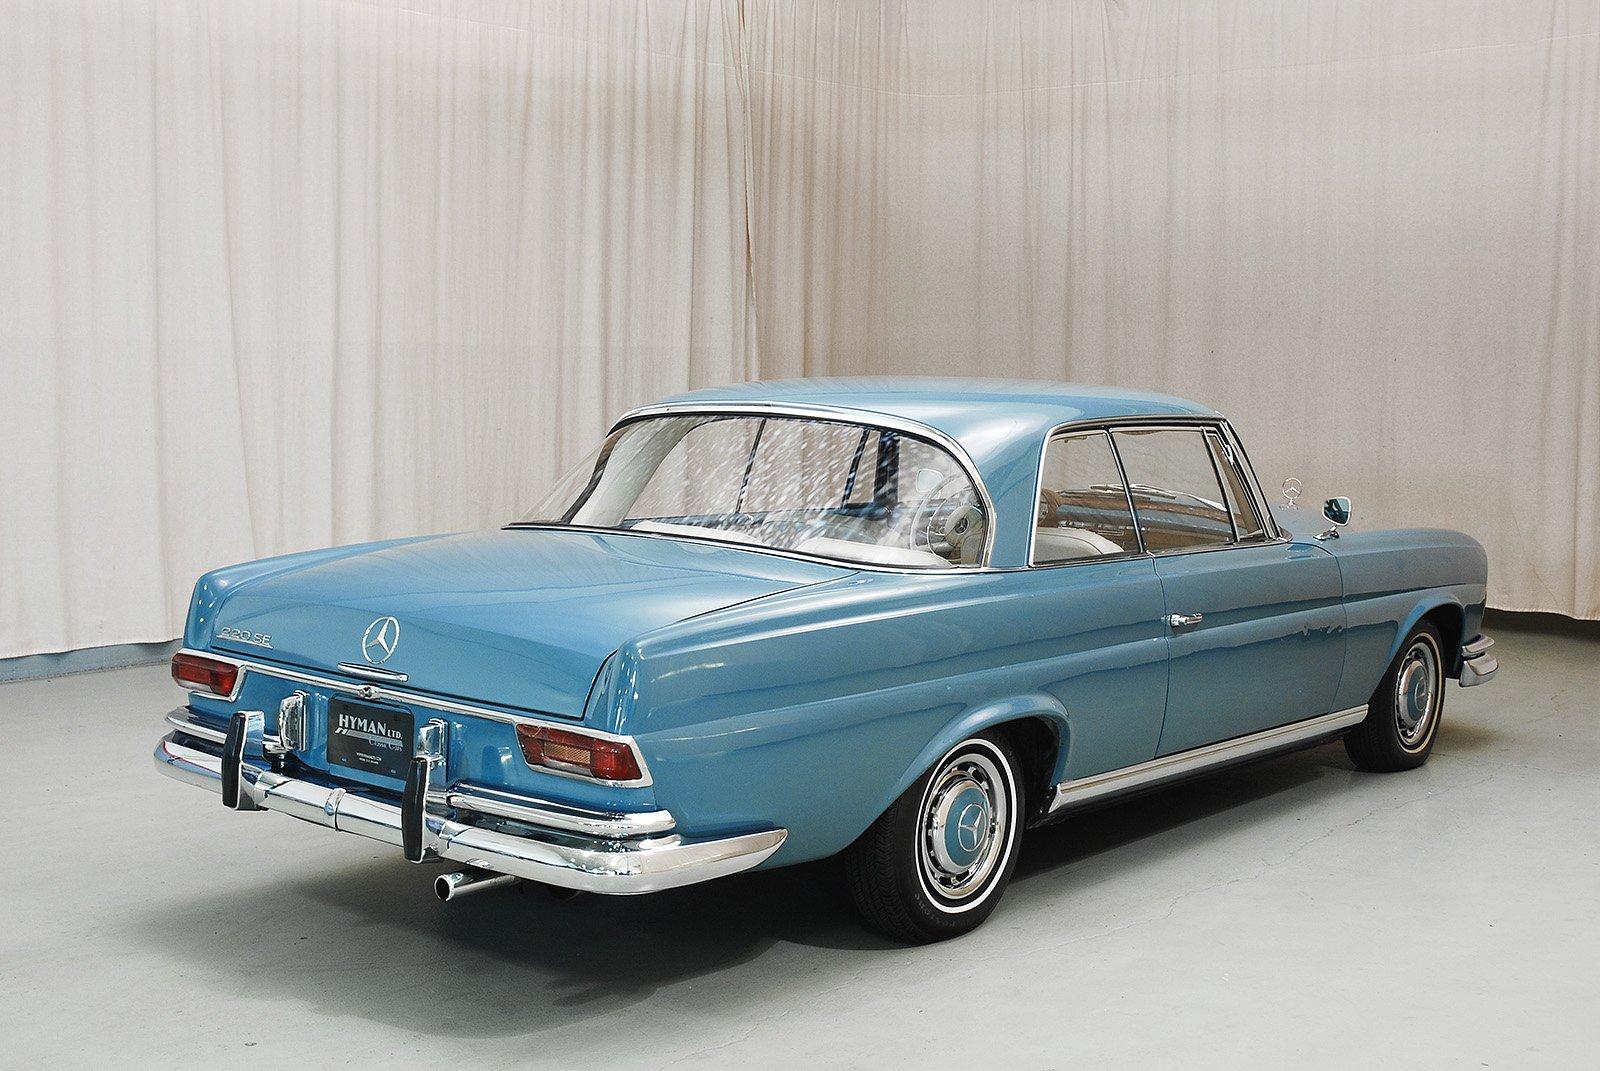 1965 mercedes benz 220se coupe hyman ltd classic cars for 1965 mercedes benz